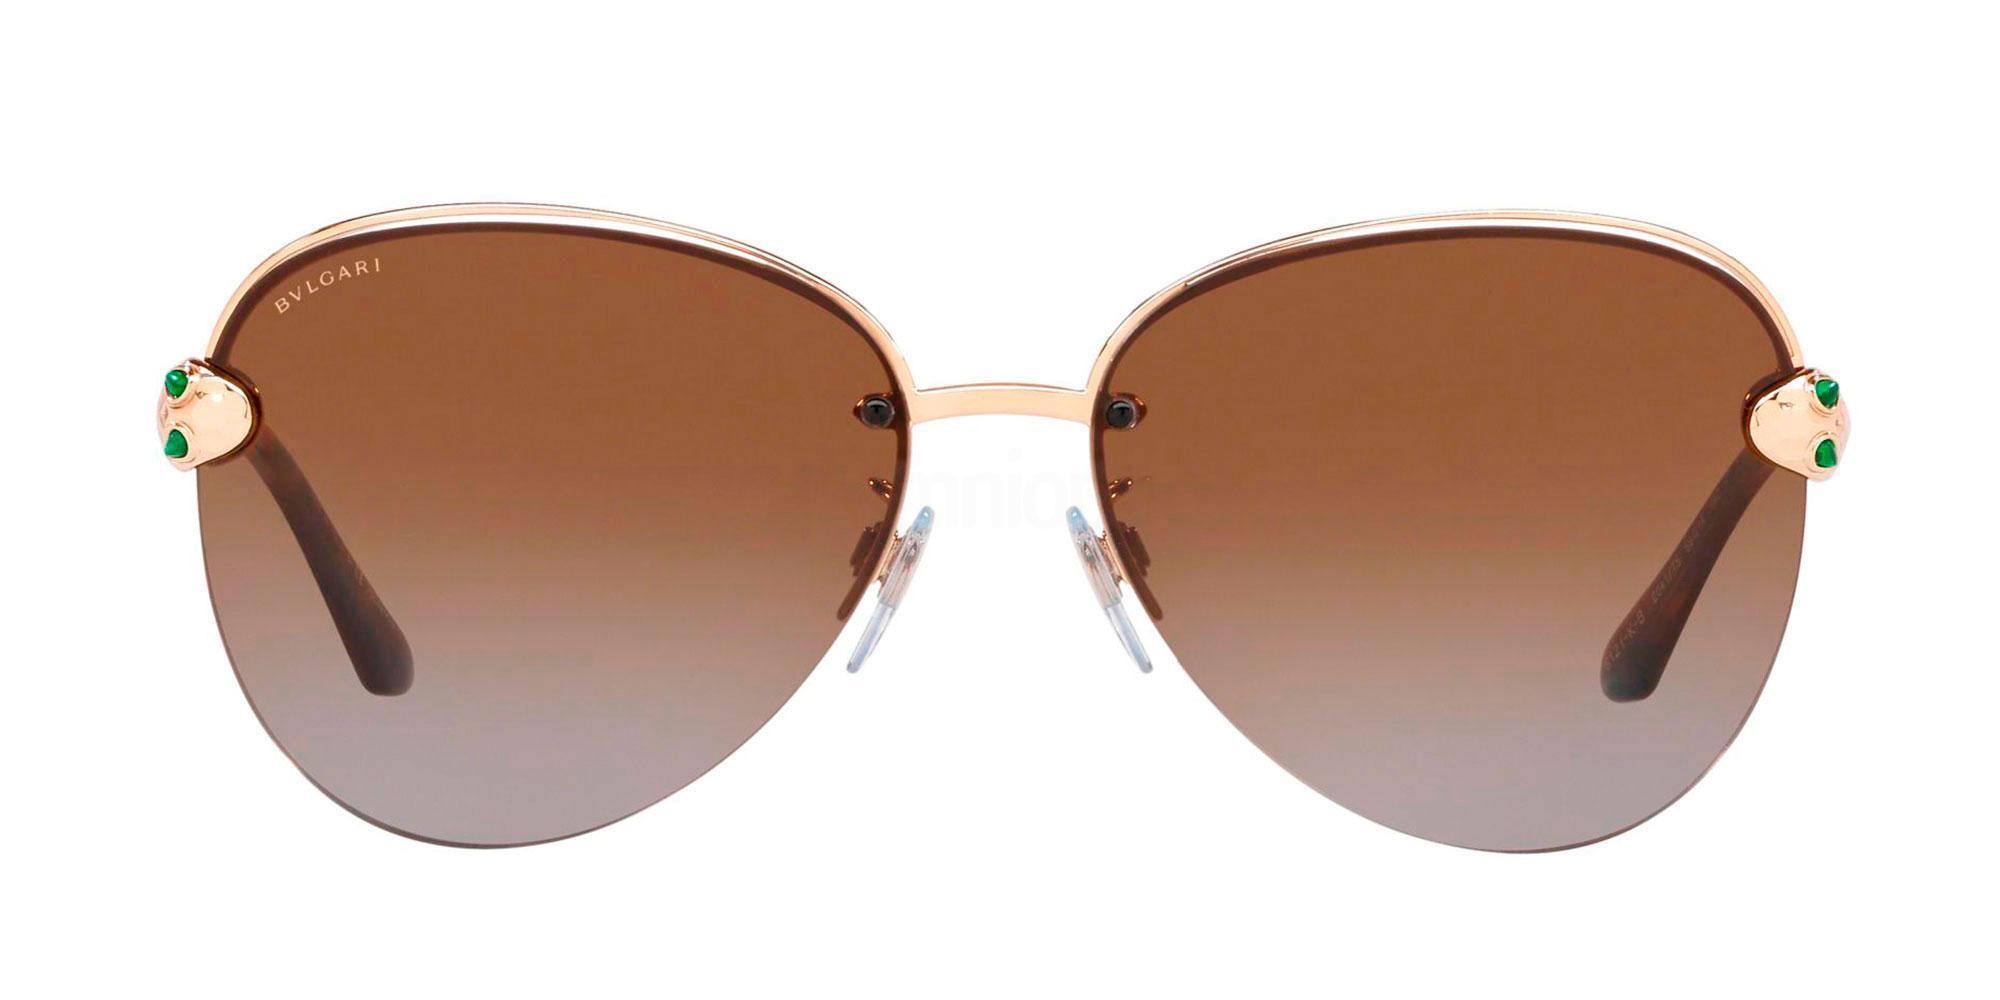 2041T5 BV6121KB Sunglasses, Bvlgari